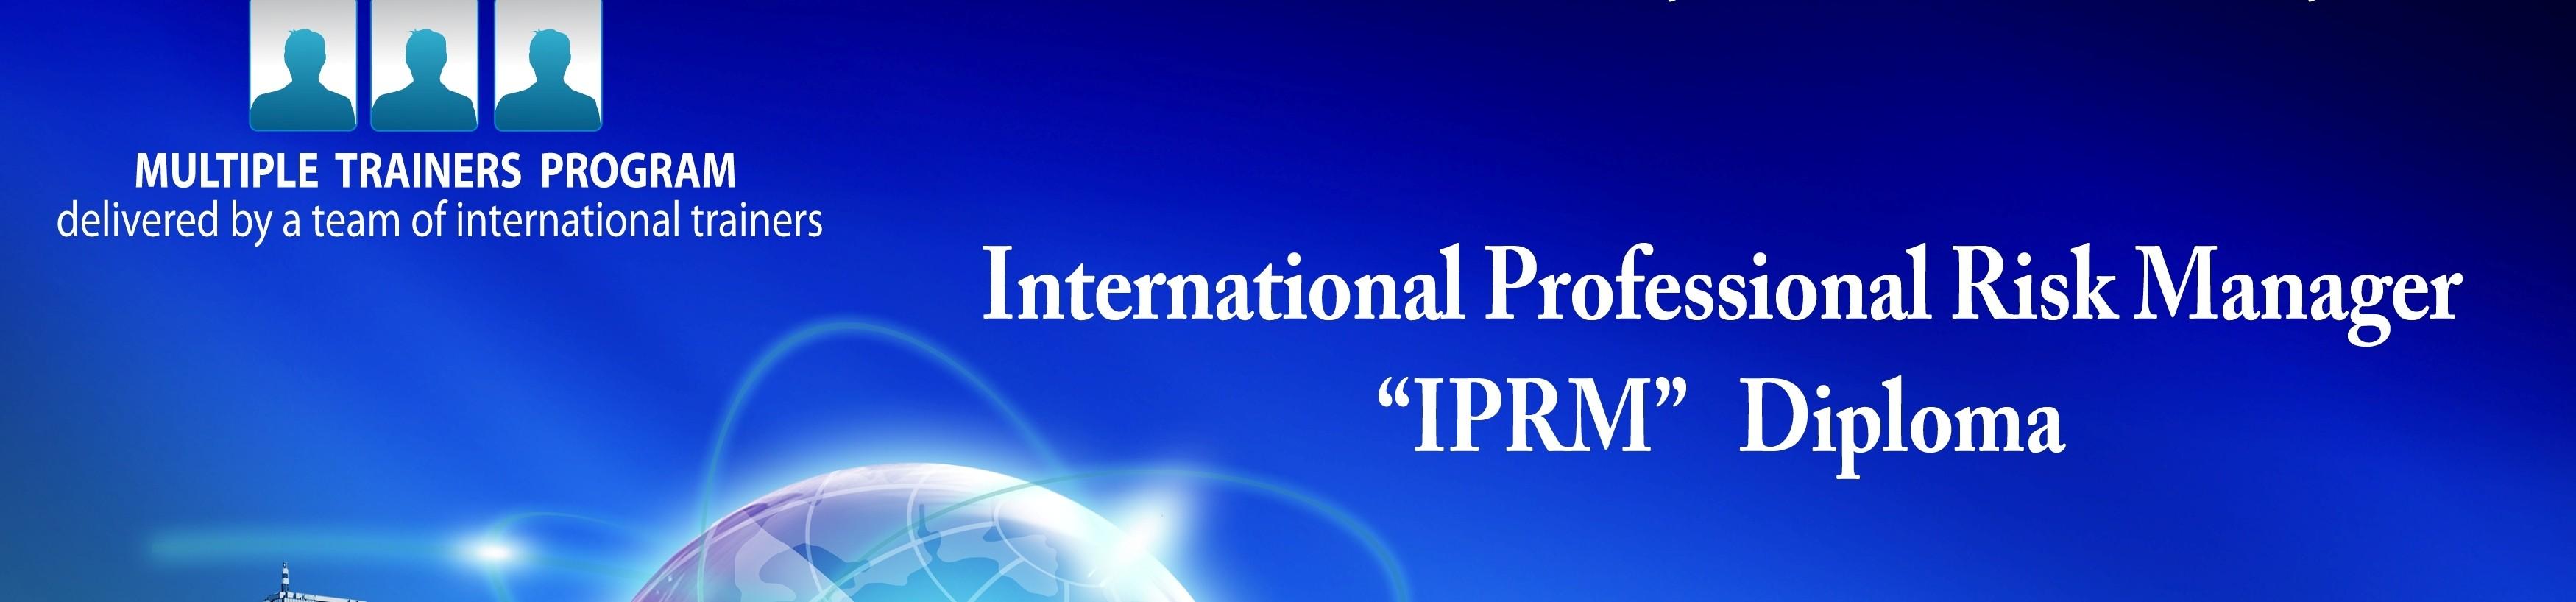 international professional risk manager diploma iprm international professional risk manager diploma iprm